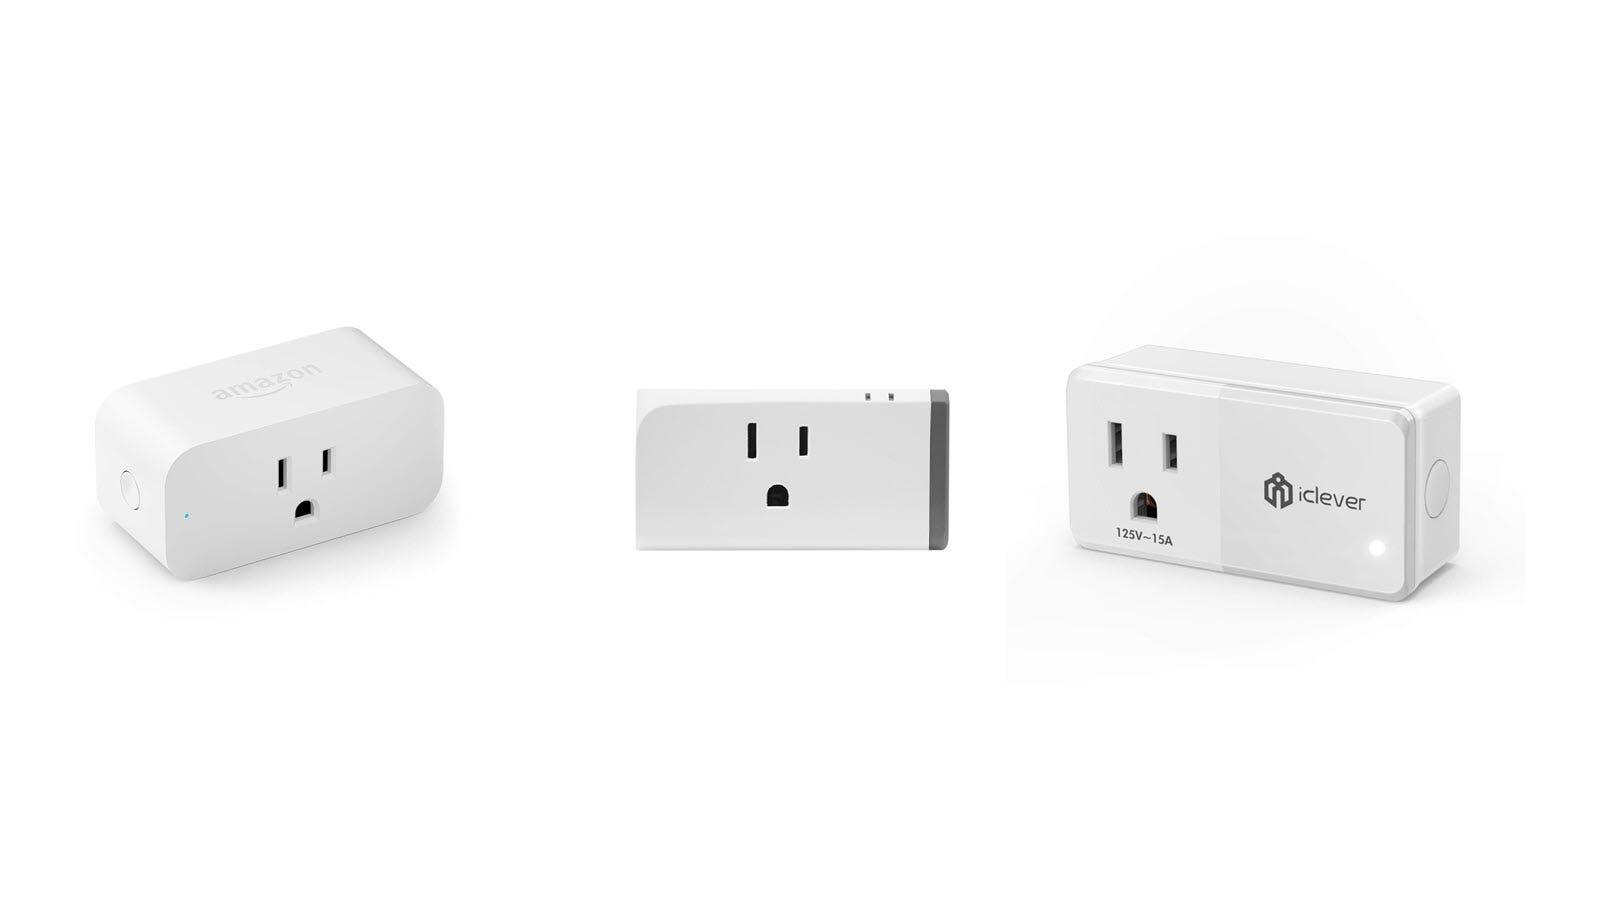 An Amazon Smart plug, Sonoff Smart Plug, and iClever smart plug side-by-side.